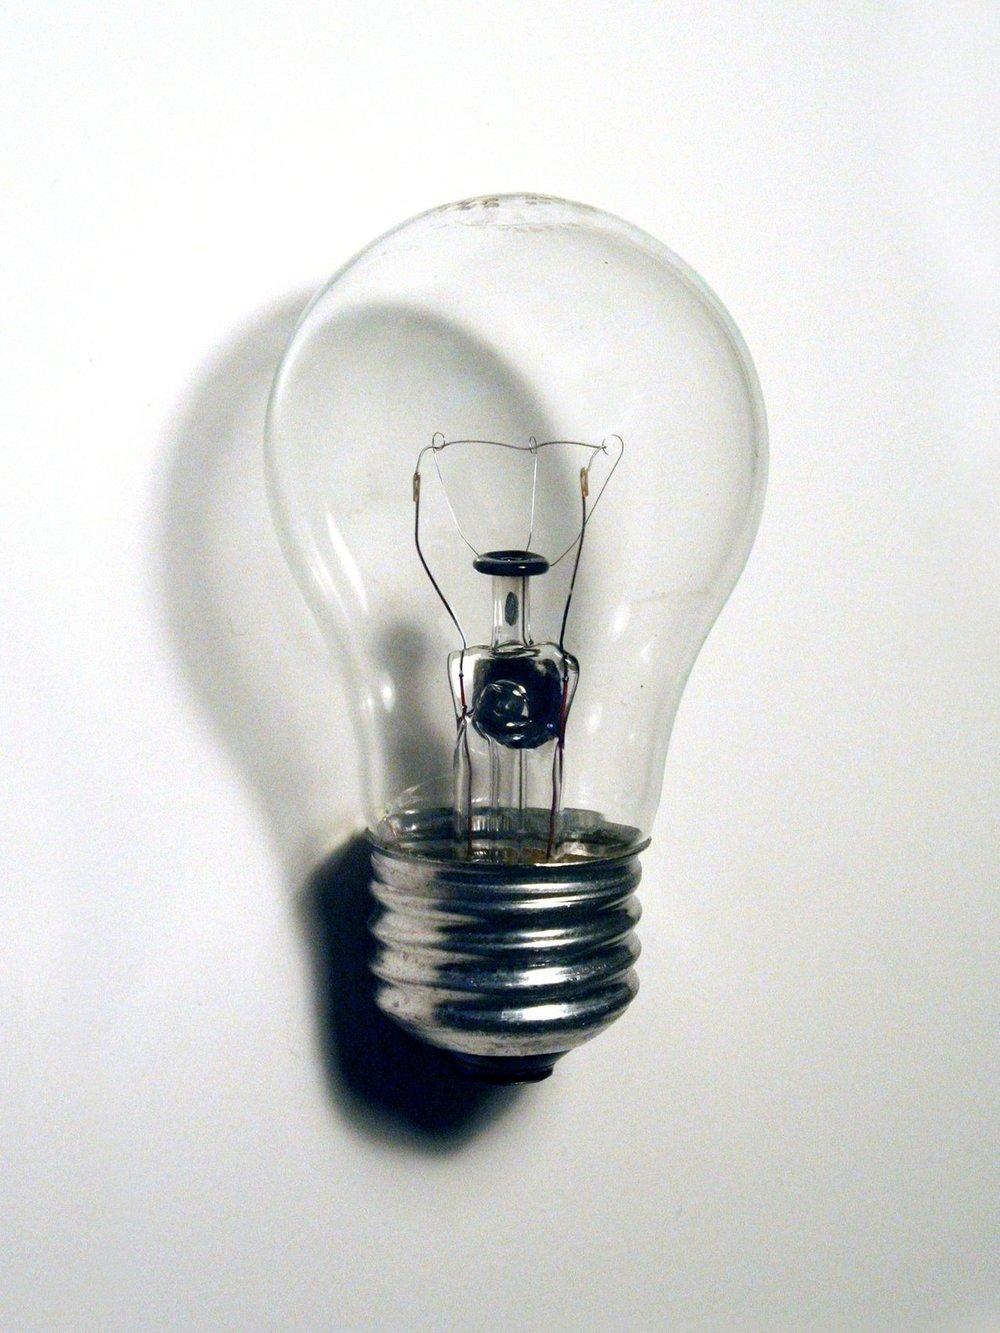 electric-bulb-1-1172792-1279x1705.jpg